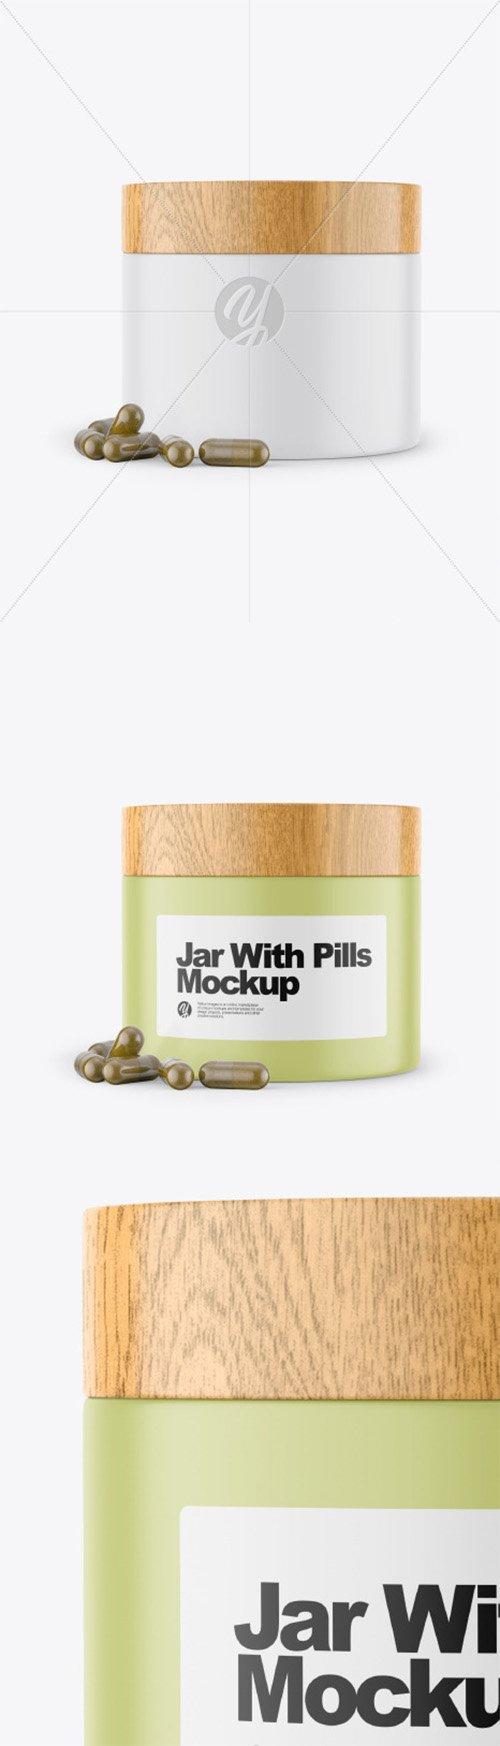 Jar With Pills Mockup 52274 TIF